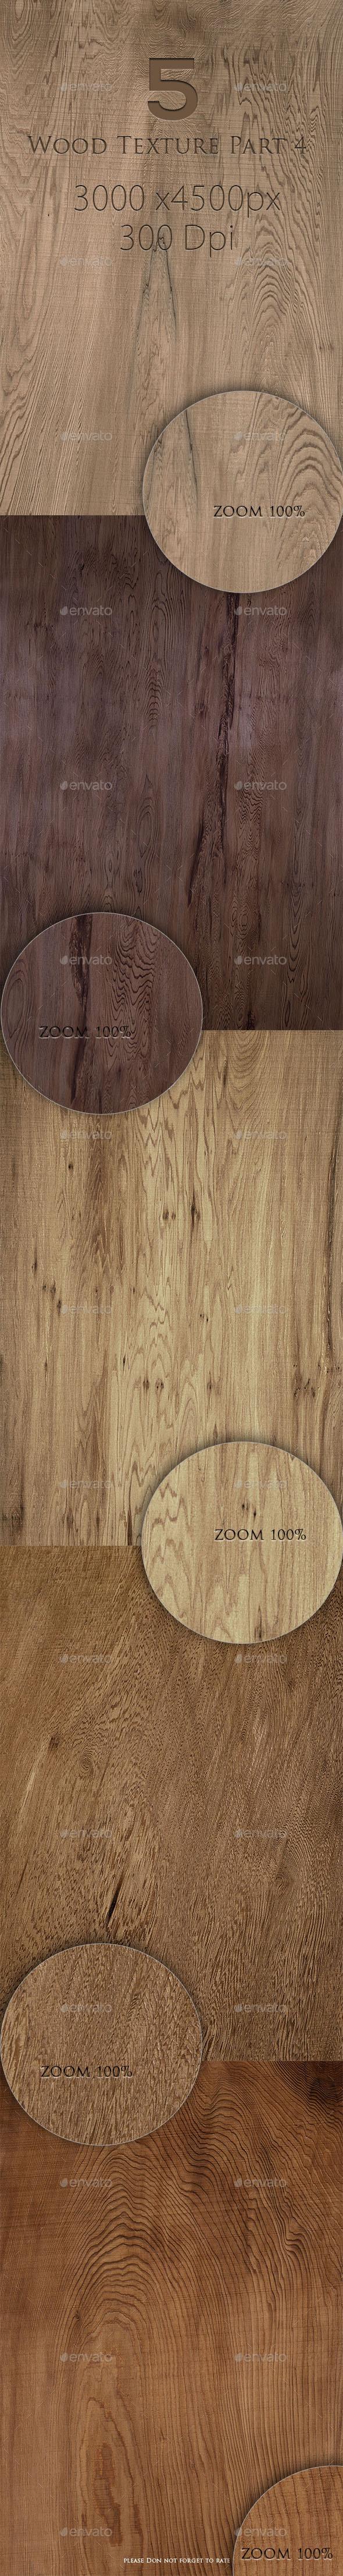 5 Wood Texture Part 4  - Wood Textures